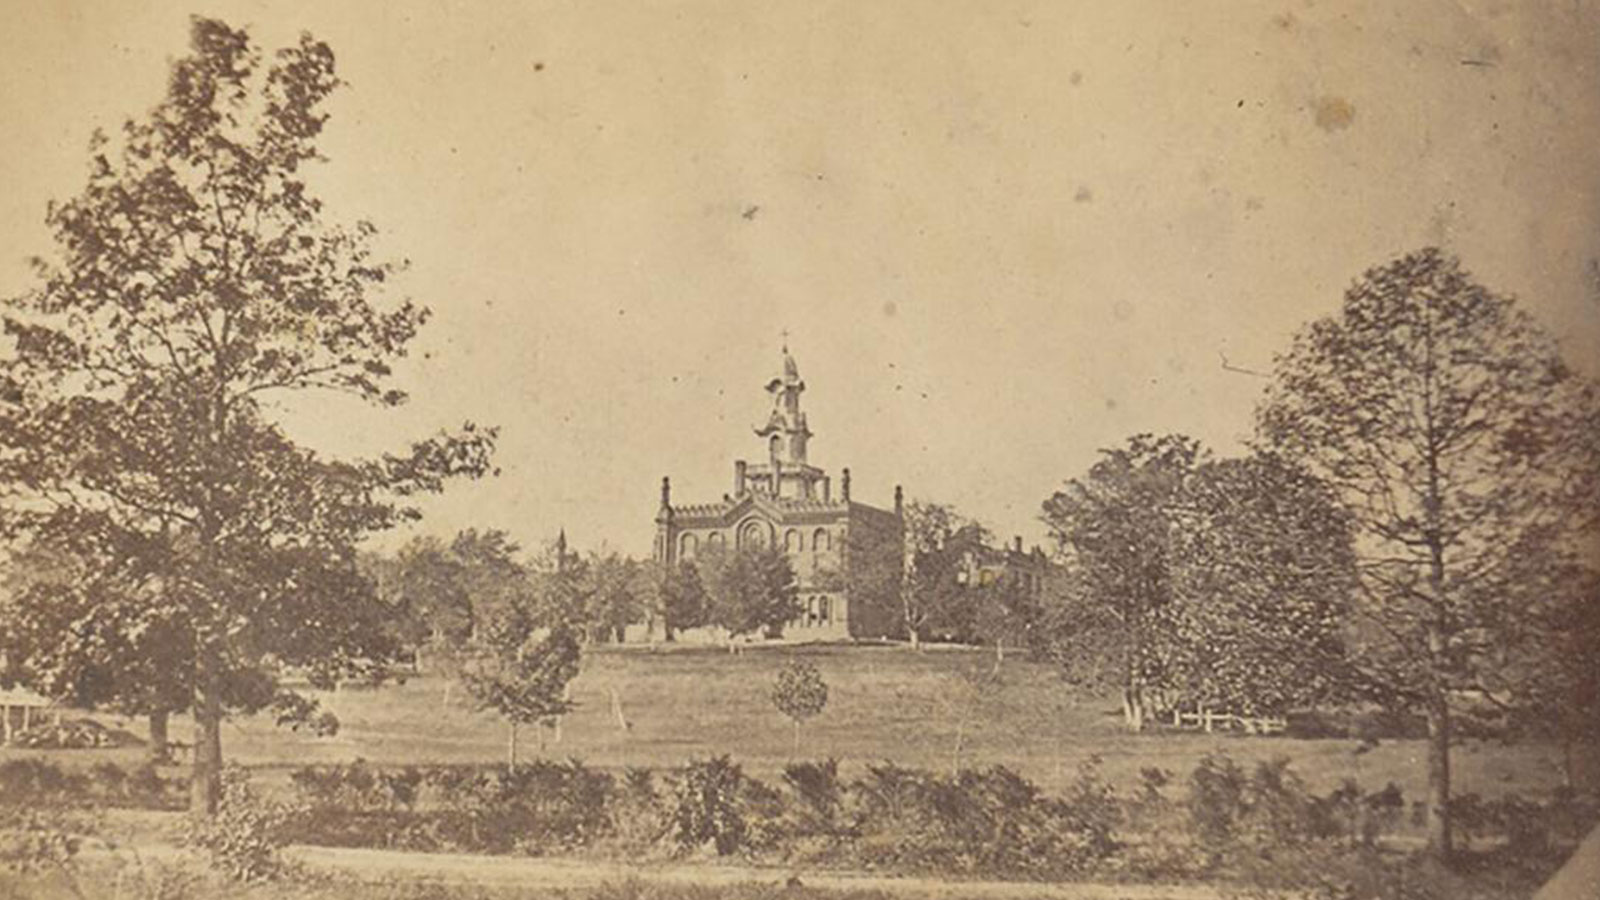 Virginia Theological Seminary 1863